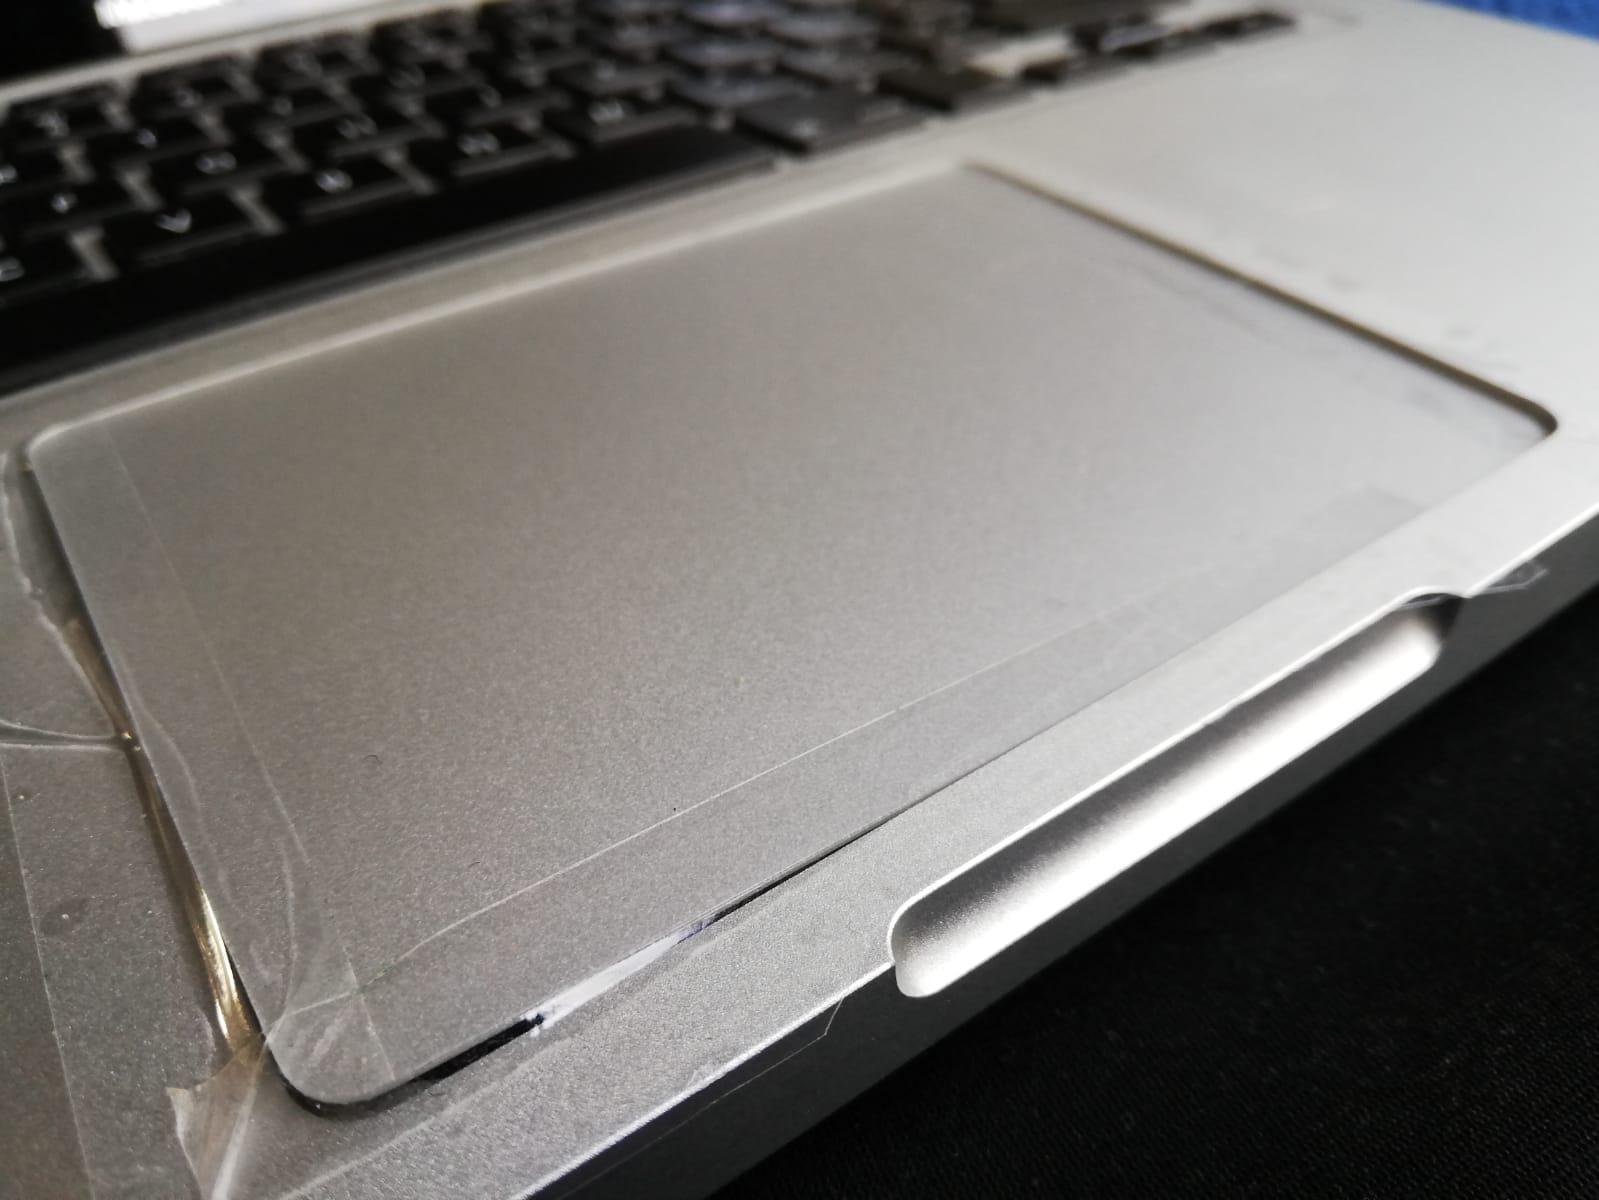 Buispad macbook pro kapot